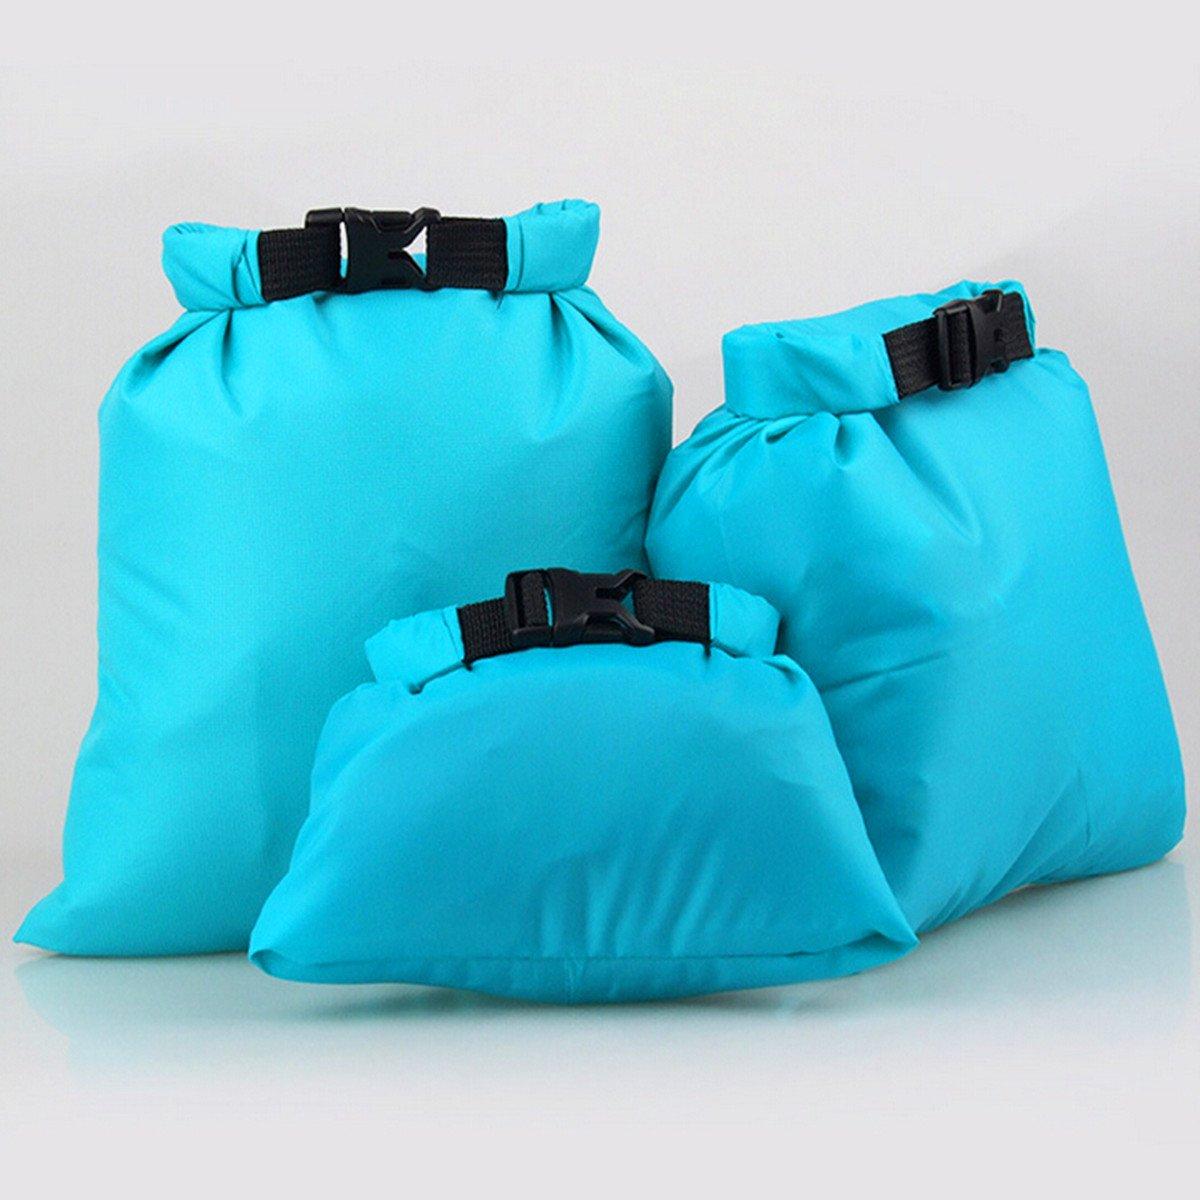 Generic yc-uk2–151124–190: Randomg custodia cover cove 1.5/2.5/3.5l set di 3custodia impermeabile campeggio canoa sacca impermeabile di colore: casuale set di 3WA YC_AME2_150319_640